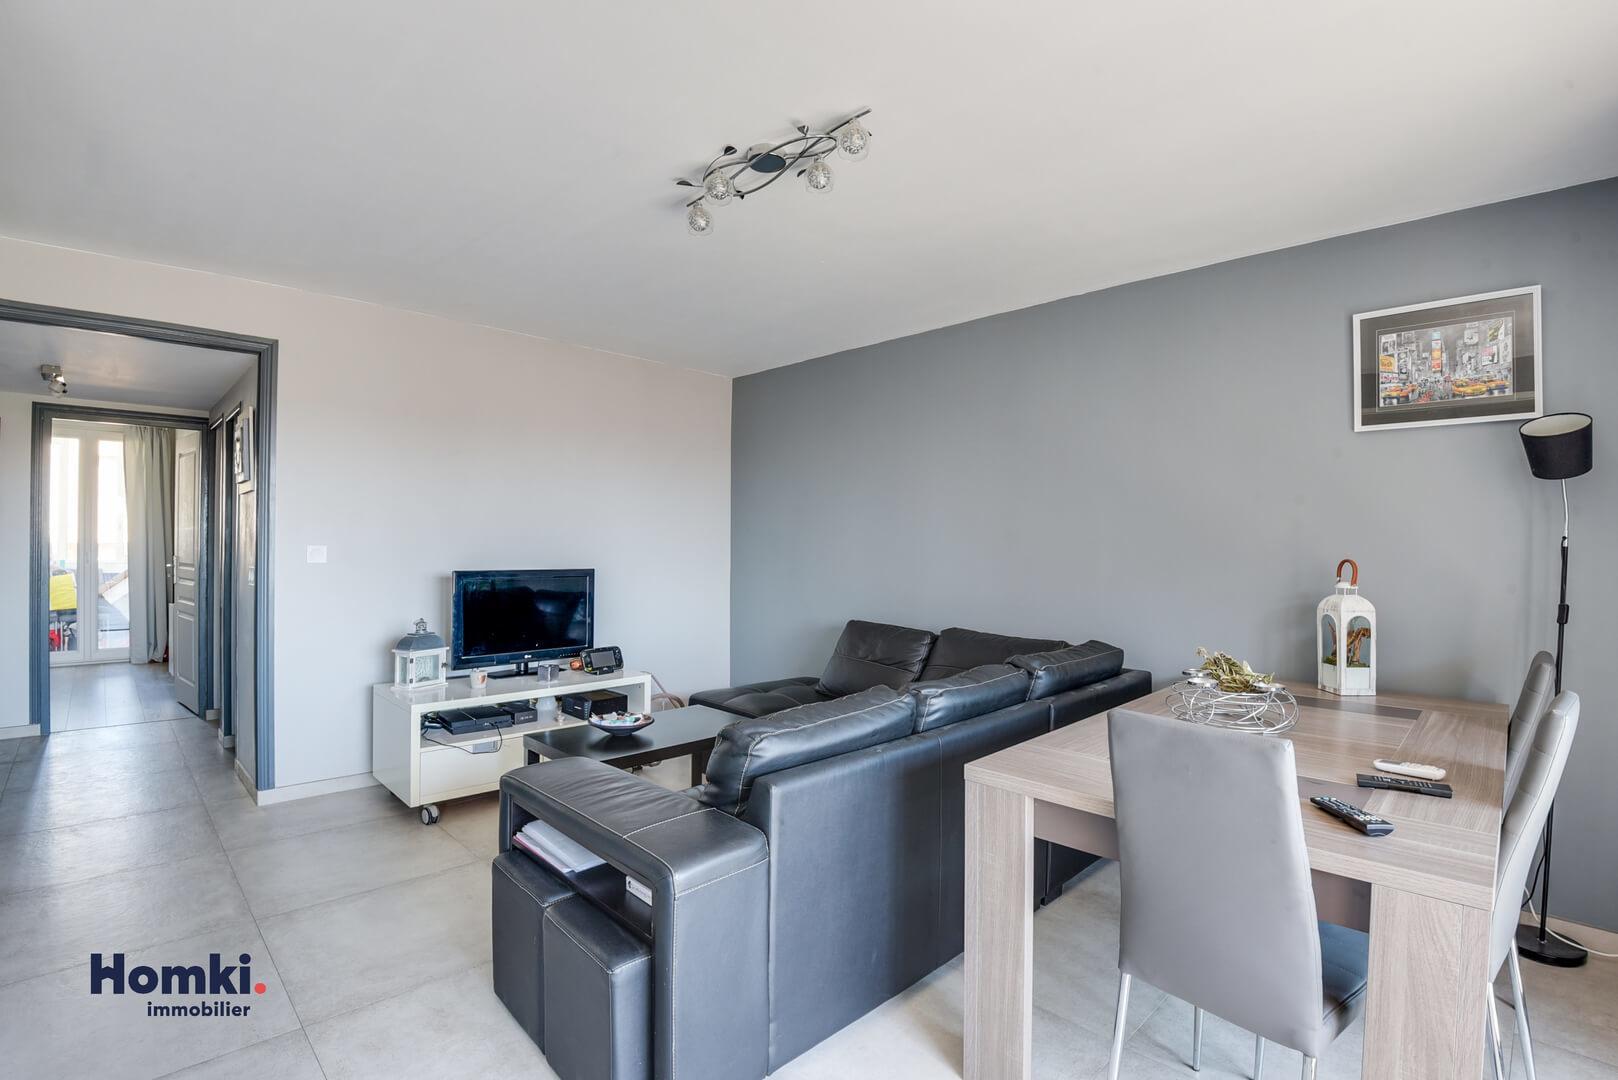 Vente Appartement 72 m² T3 13014 Marseille_3